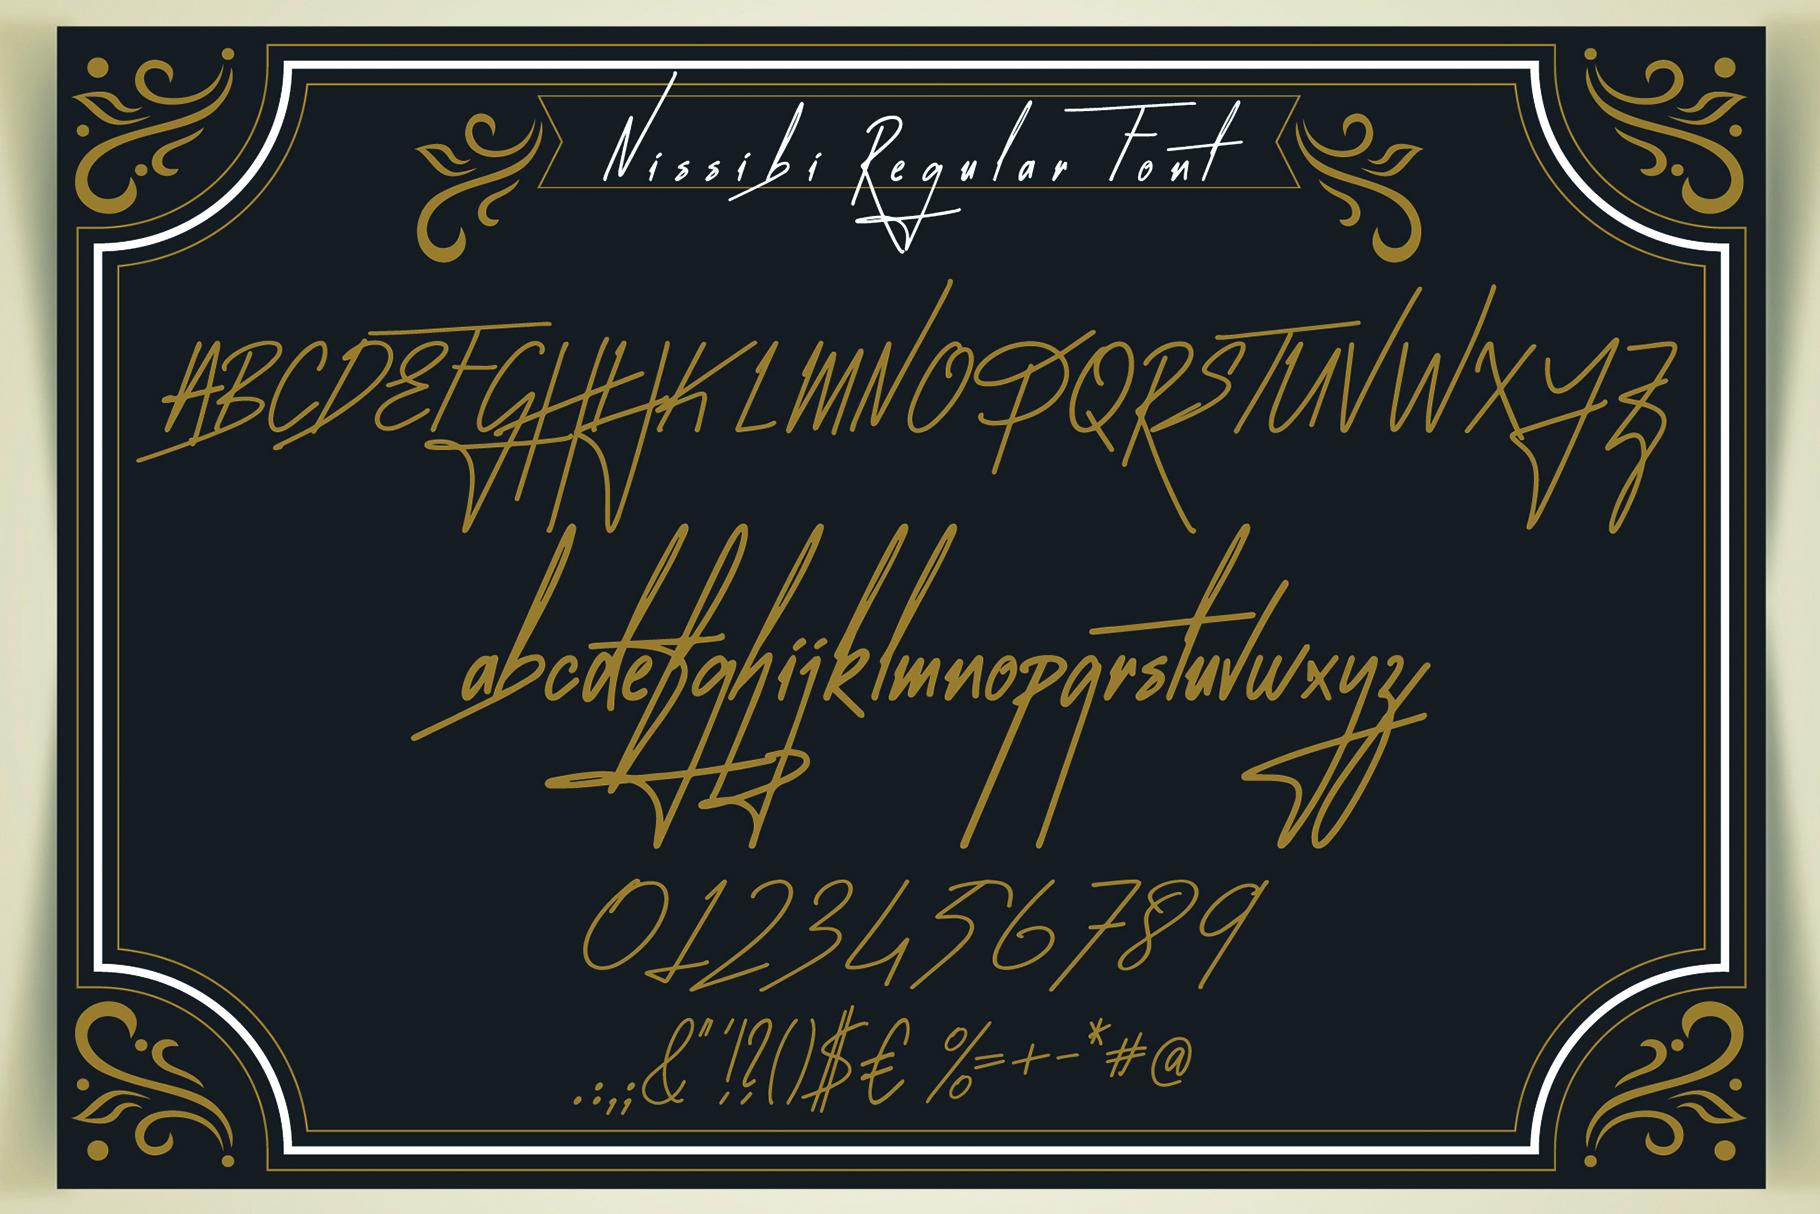 Nissibi Regular Signature Font example image 11